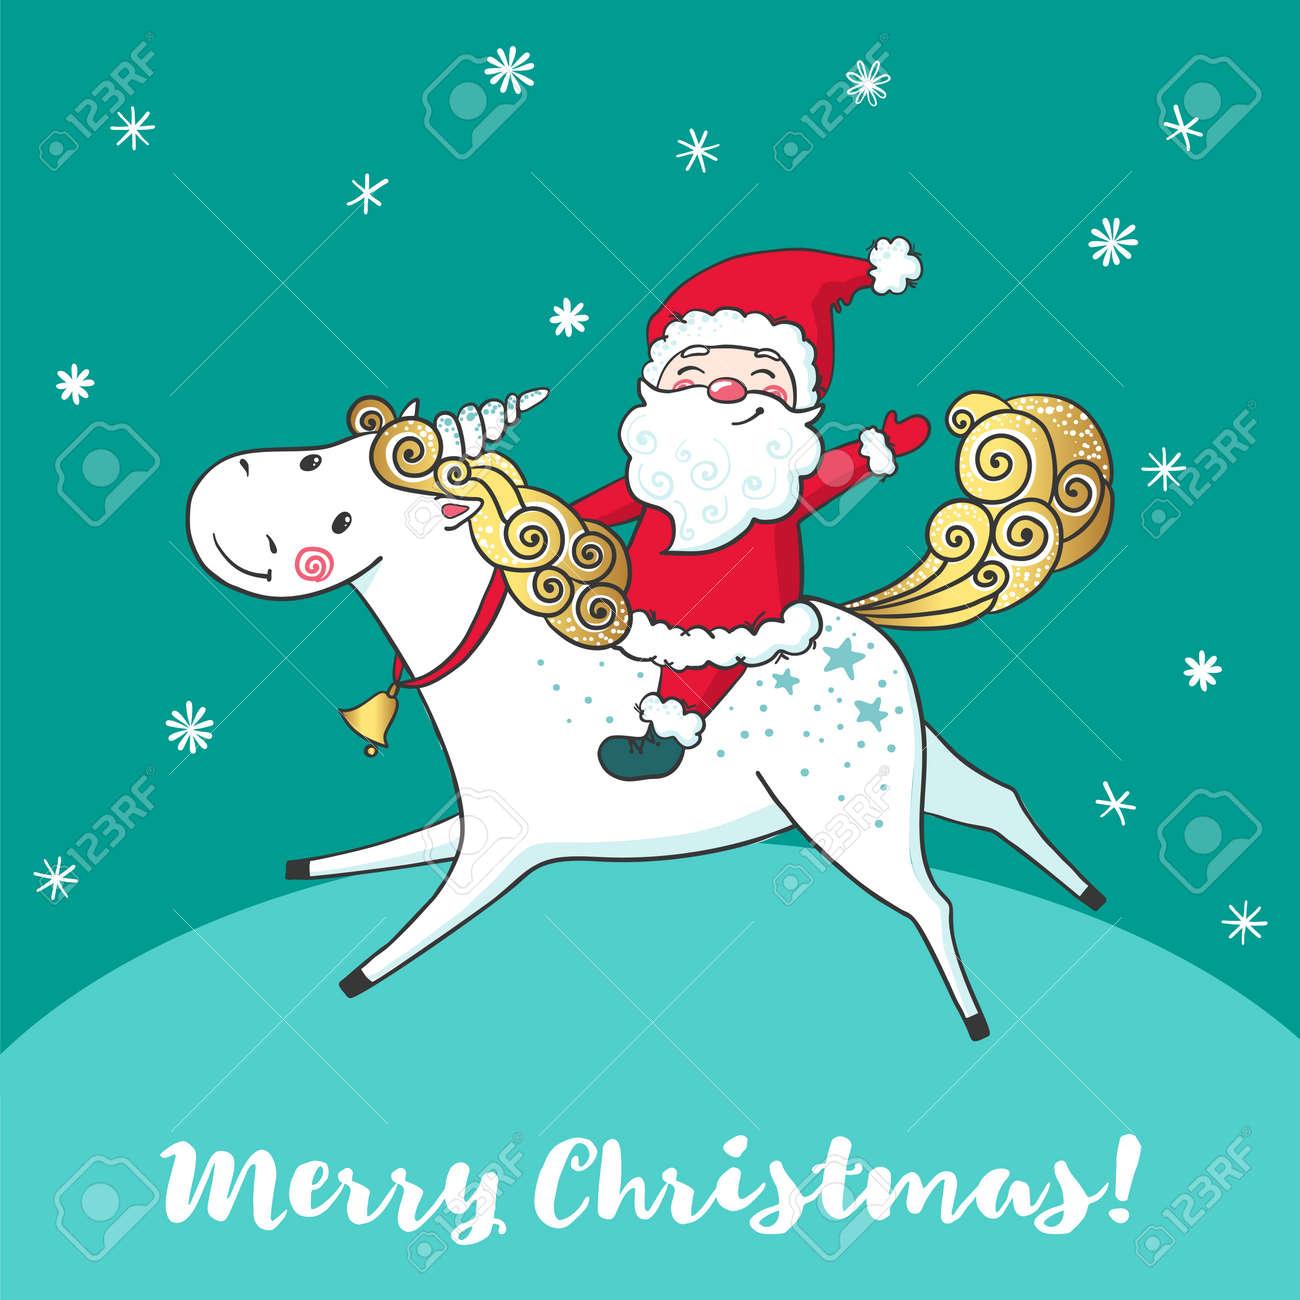 Greeting card with cute unicorn and santa claus royalty free greeting card with cute unicorn and santa claus stock vector 87738818 m4hsunfo